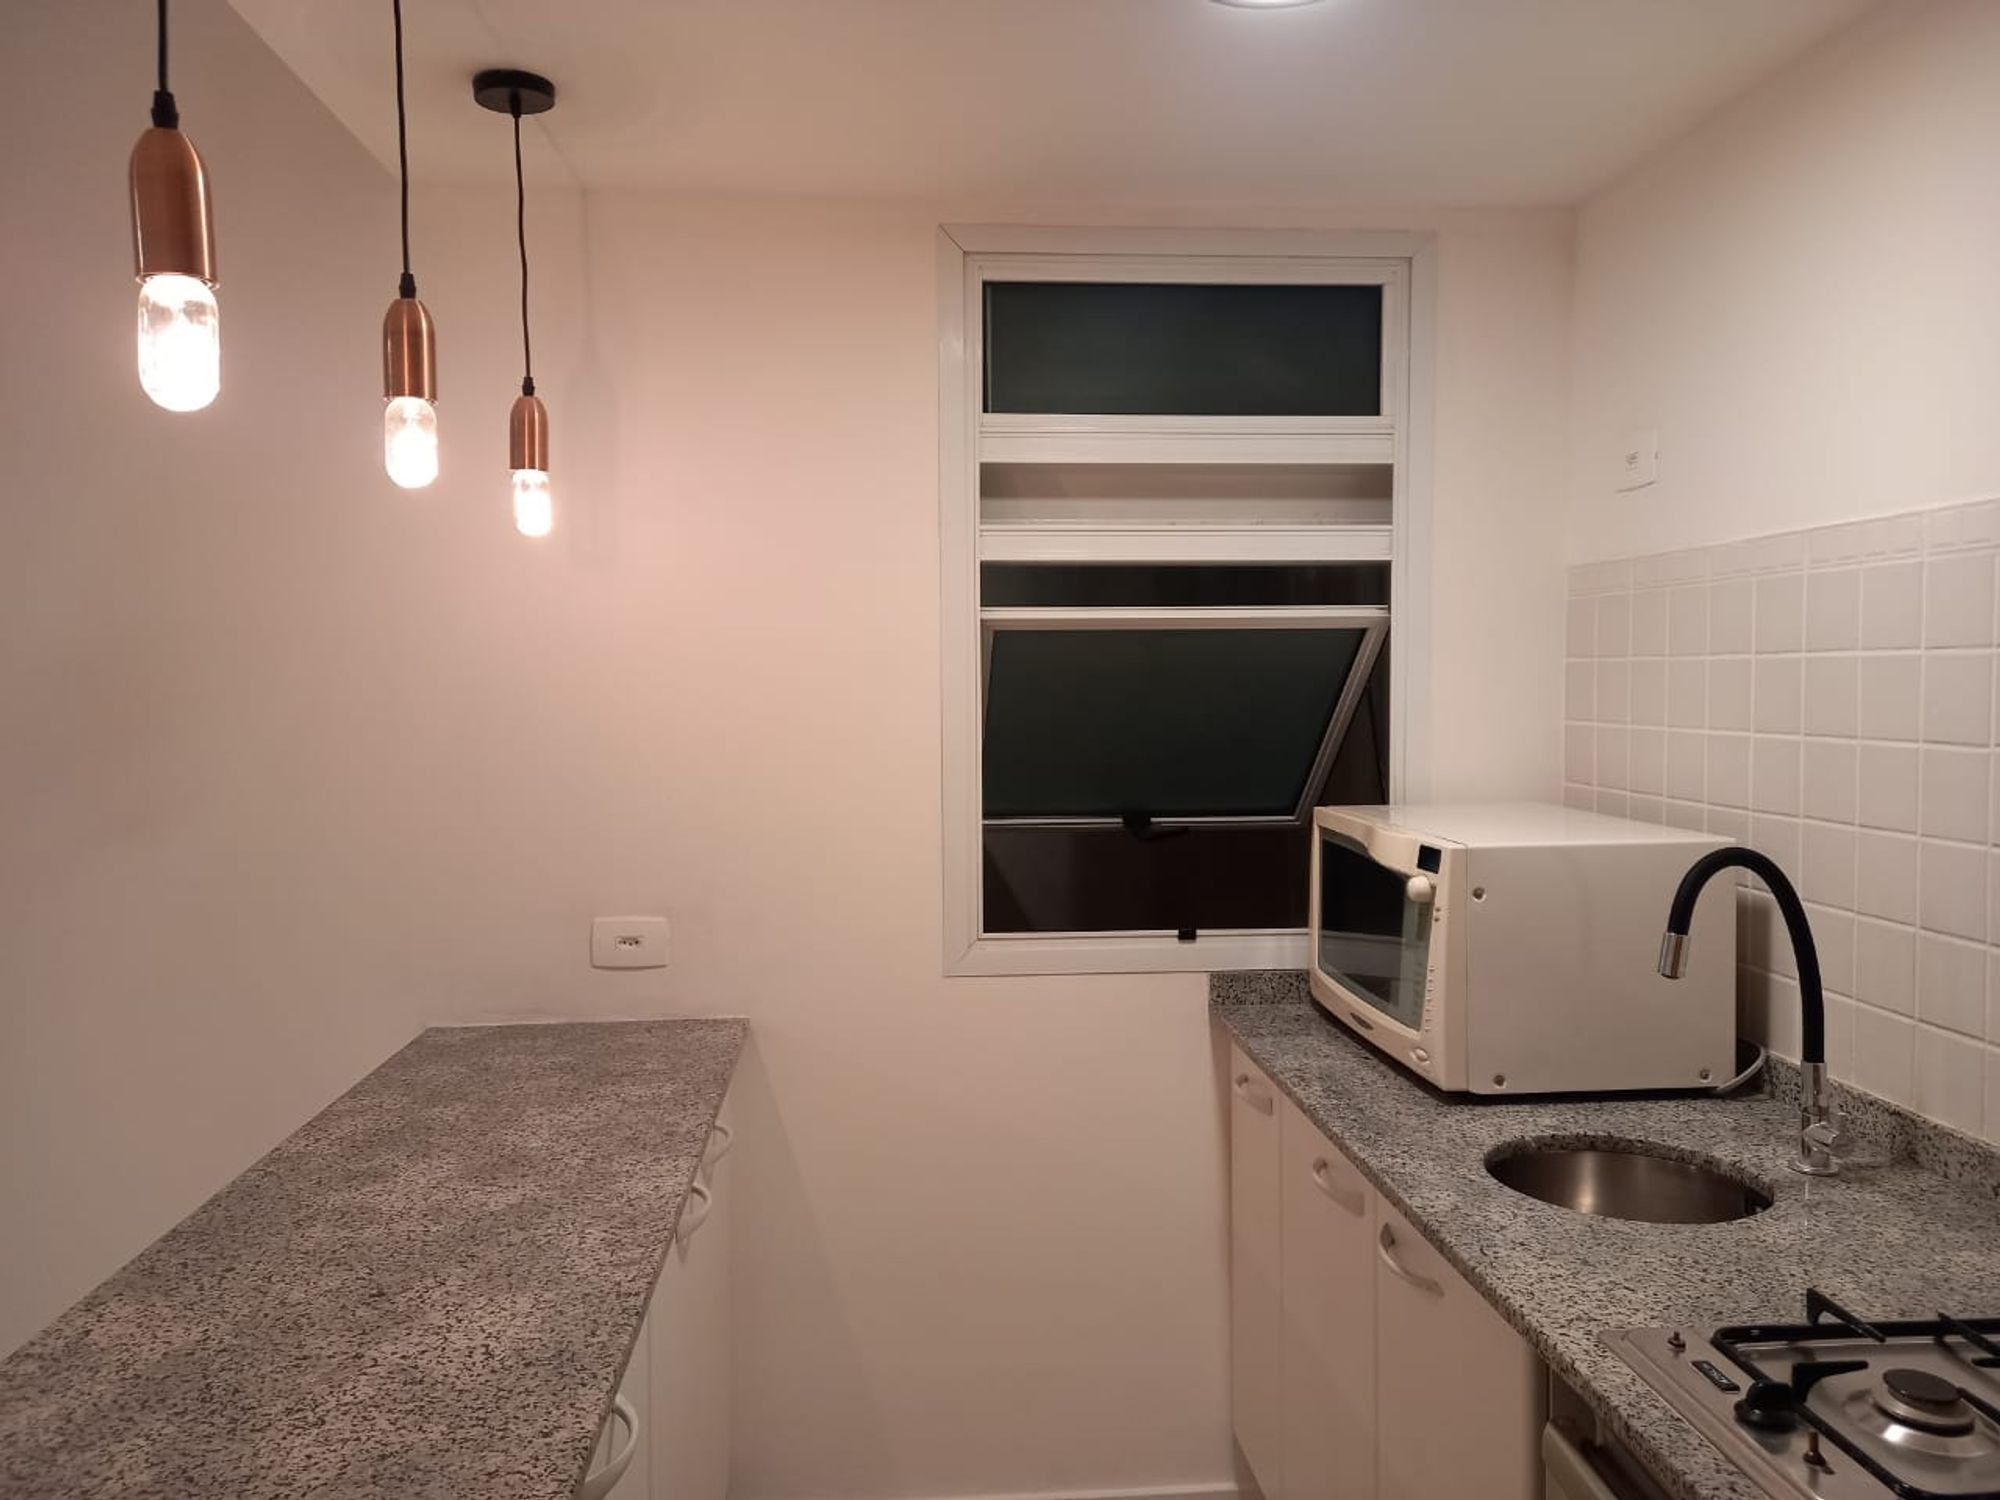 Foto de Sala com forno, pia, microondas